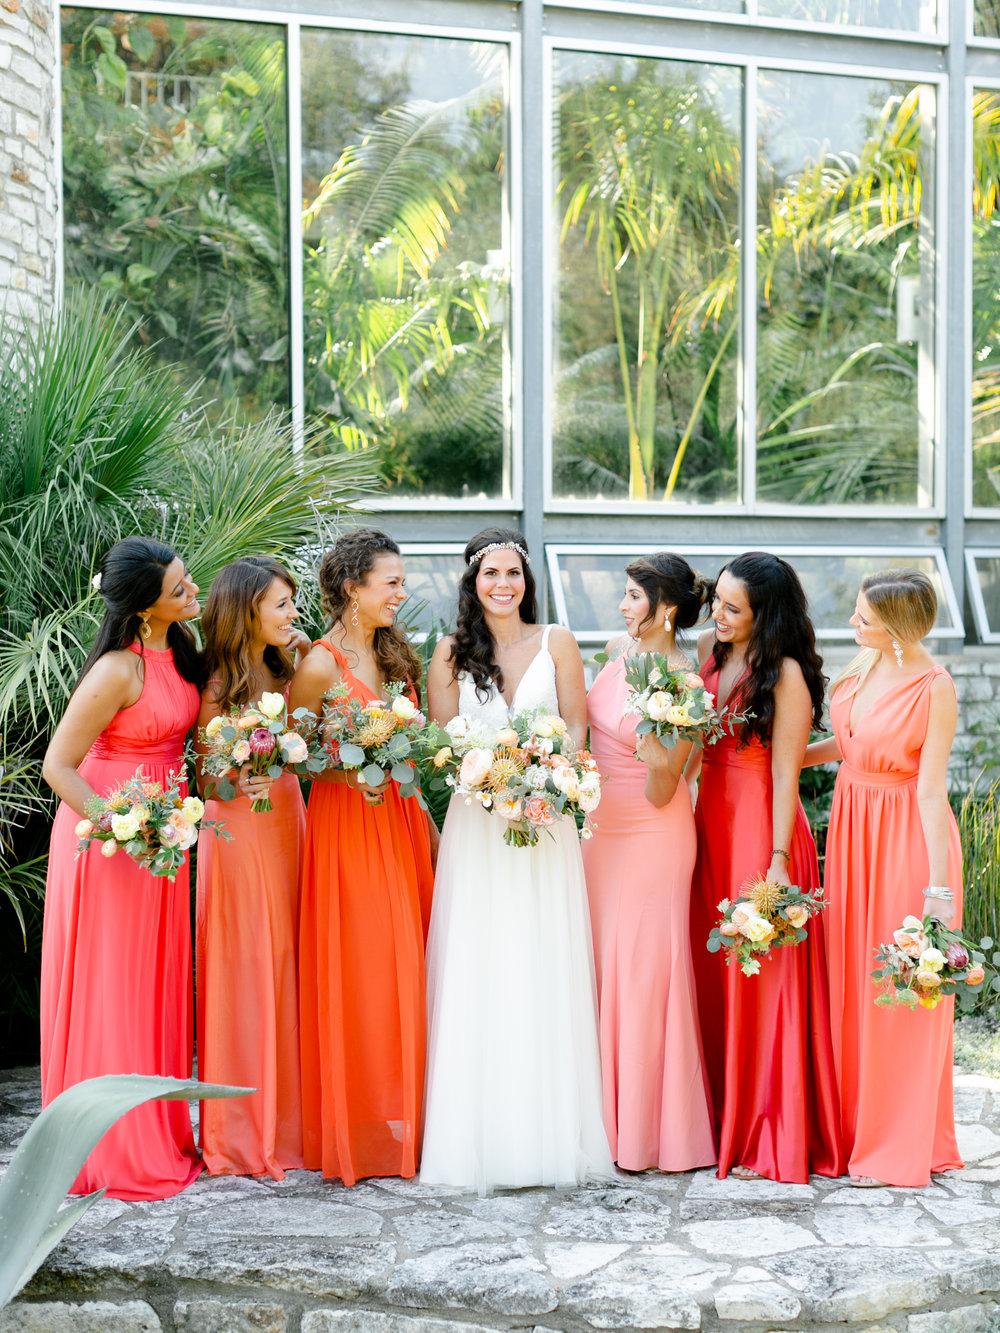 Best-Austin-Denver-California-Wedding-Photographer-Greenhouse-Driftwood21.jpg